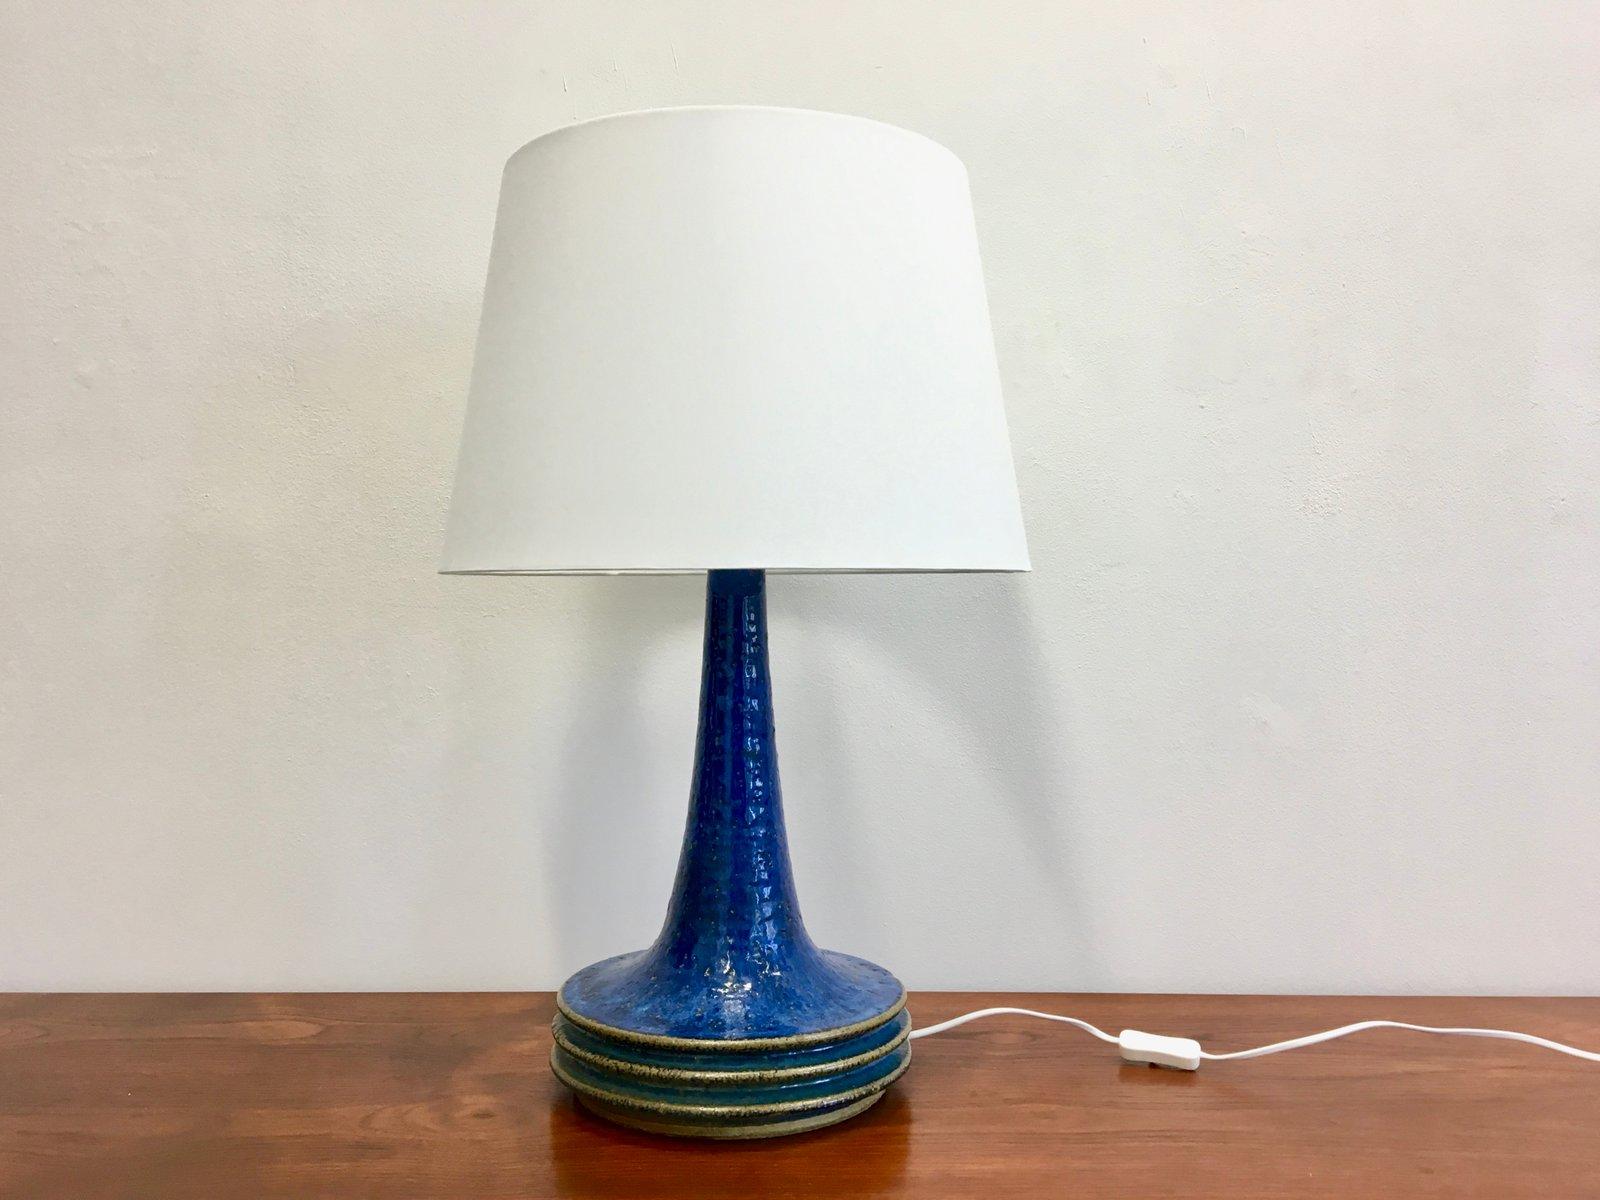 Mid Century Danish Blue Ceramic Table Lamp By Axella For Tromborg, 1970s